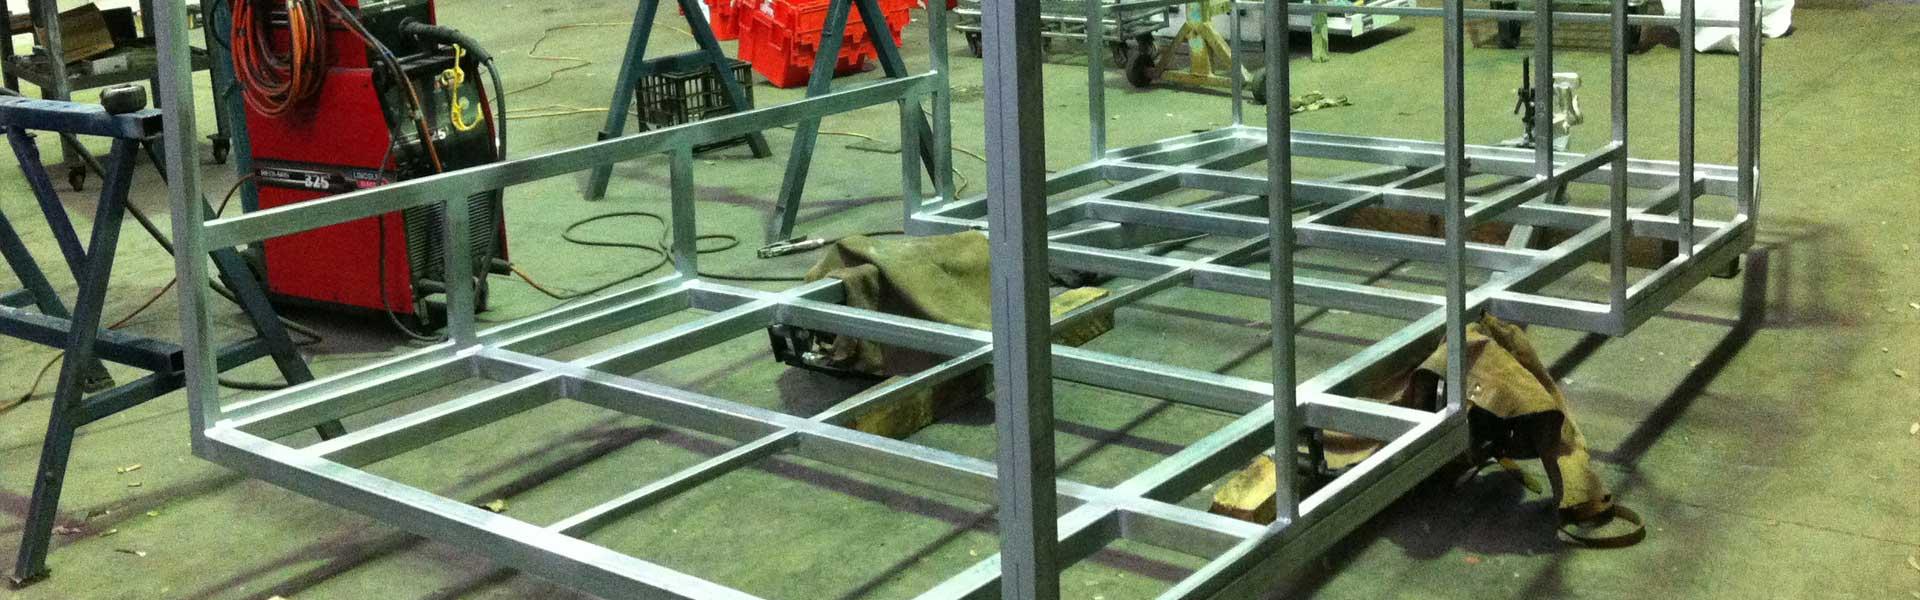 Steel Fabrication Penrith